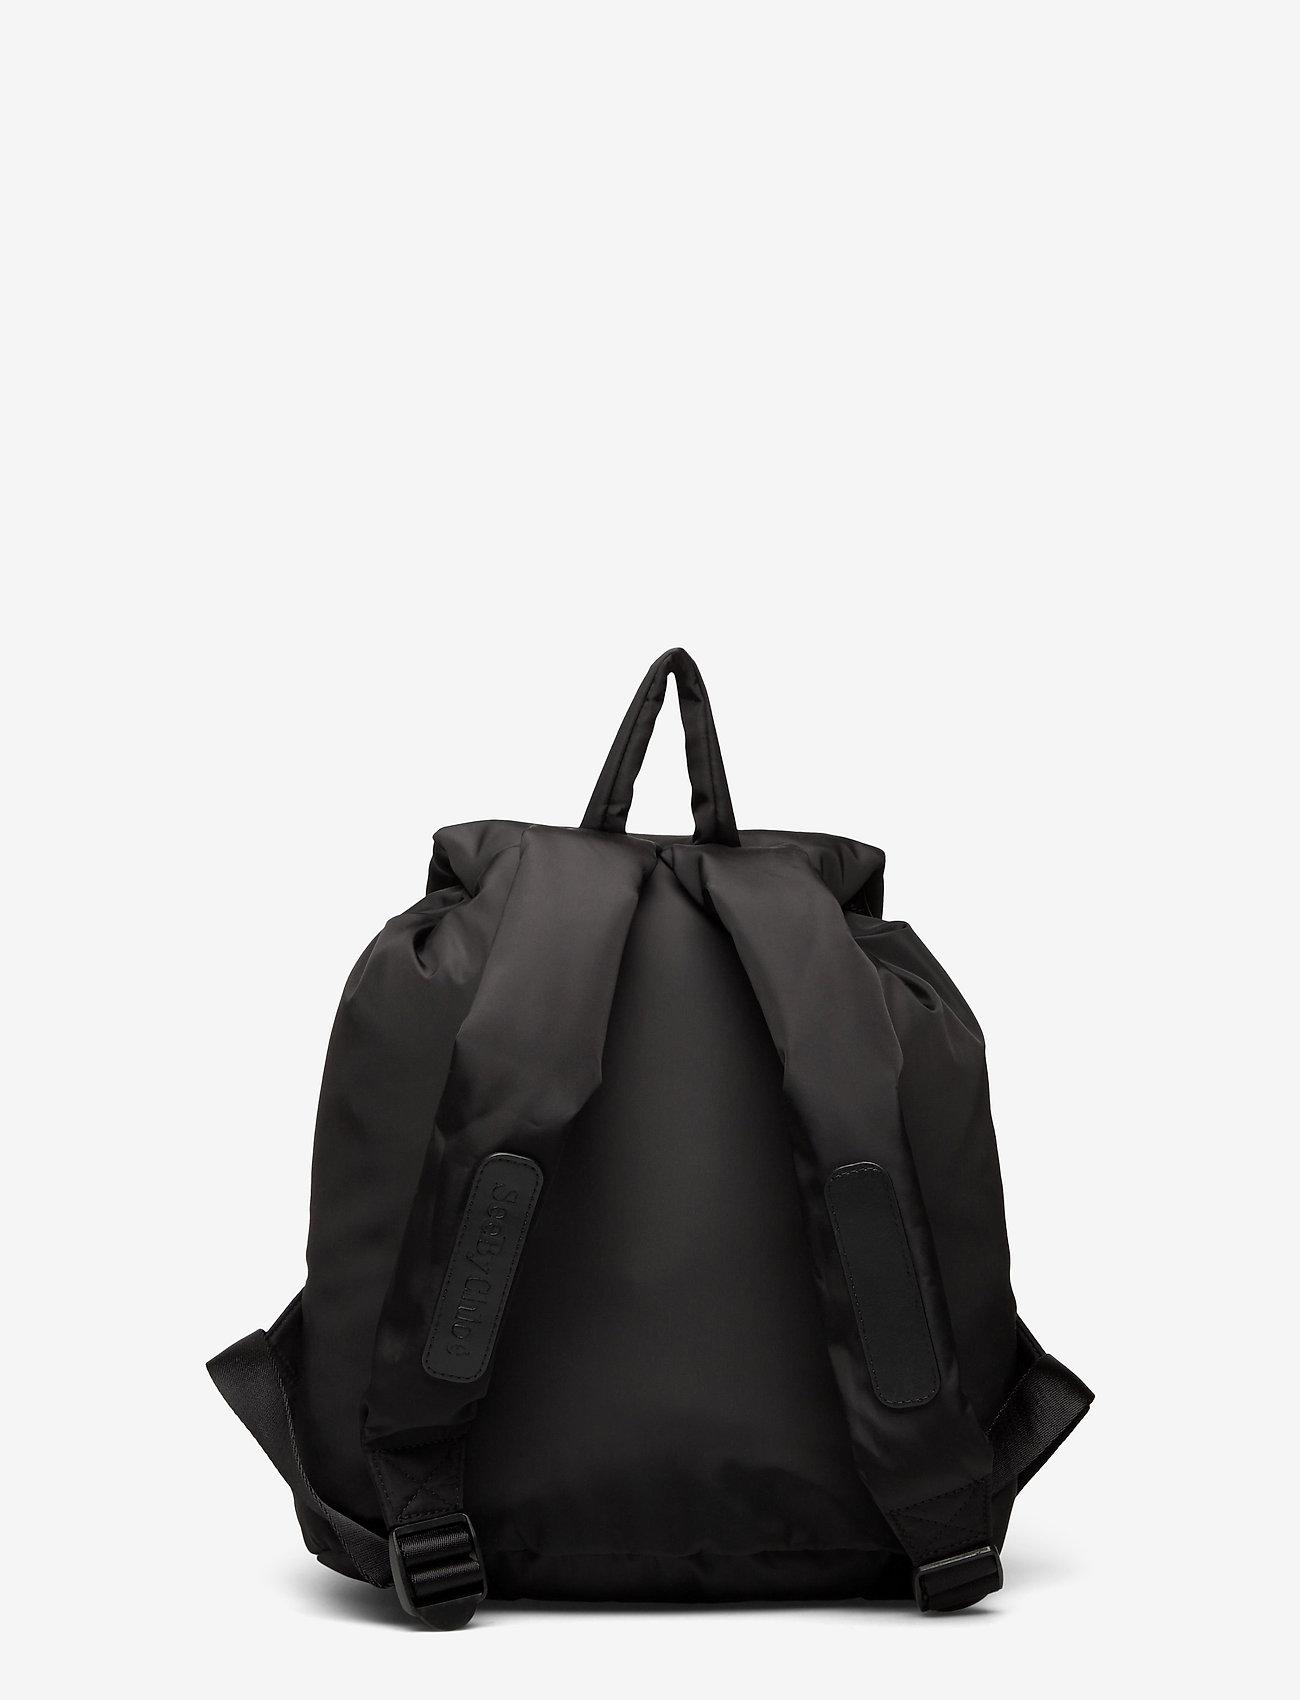 See by Chloé - JOY RIDER - tassen - black - 1